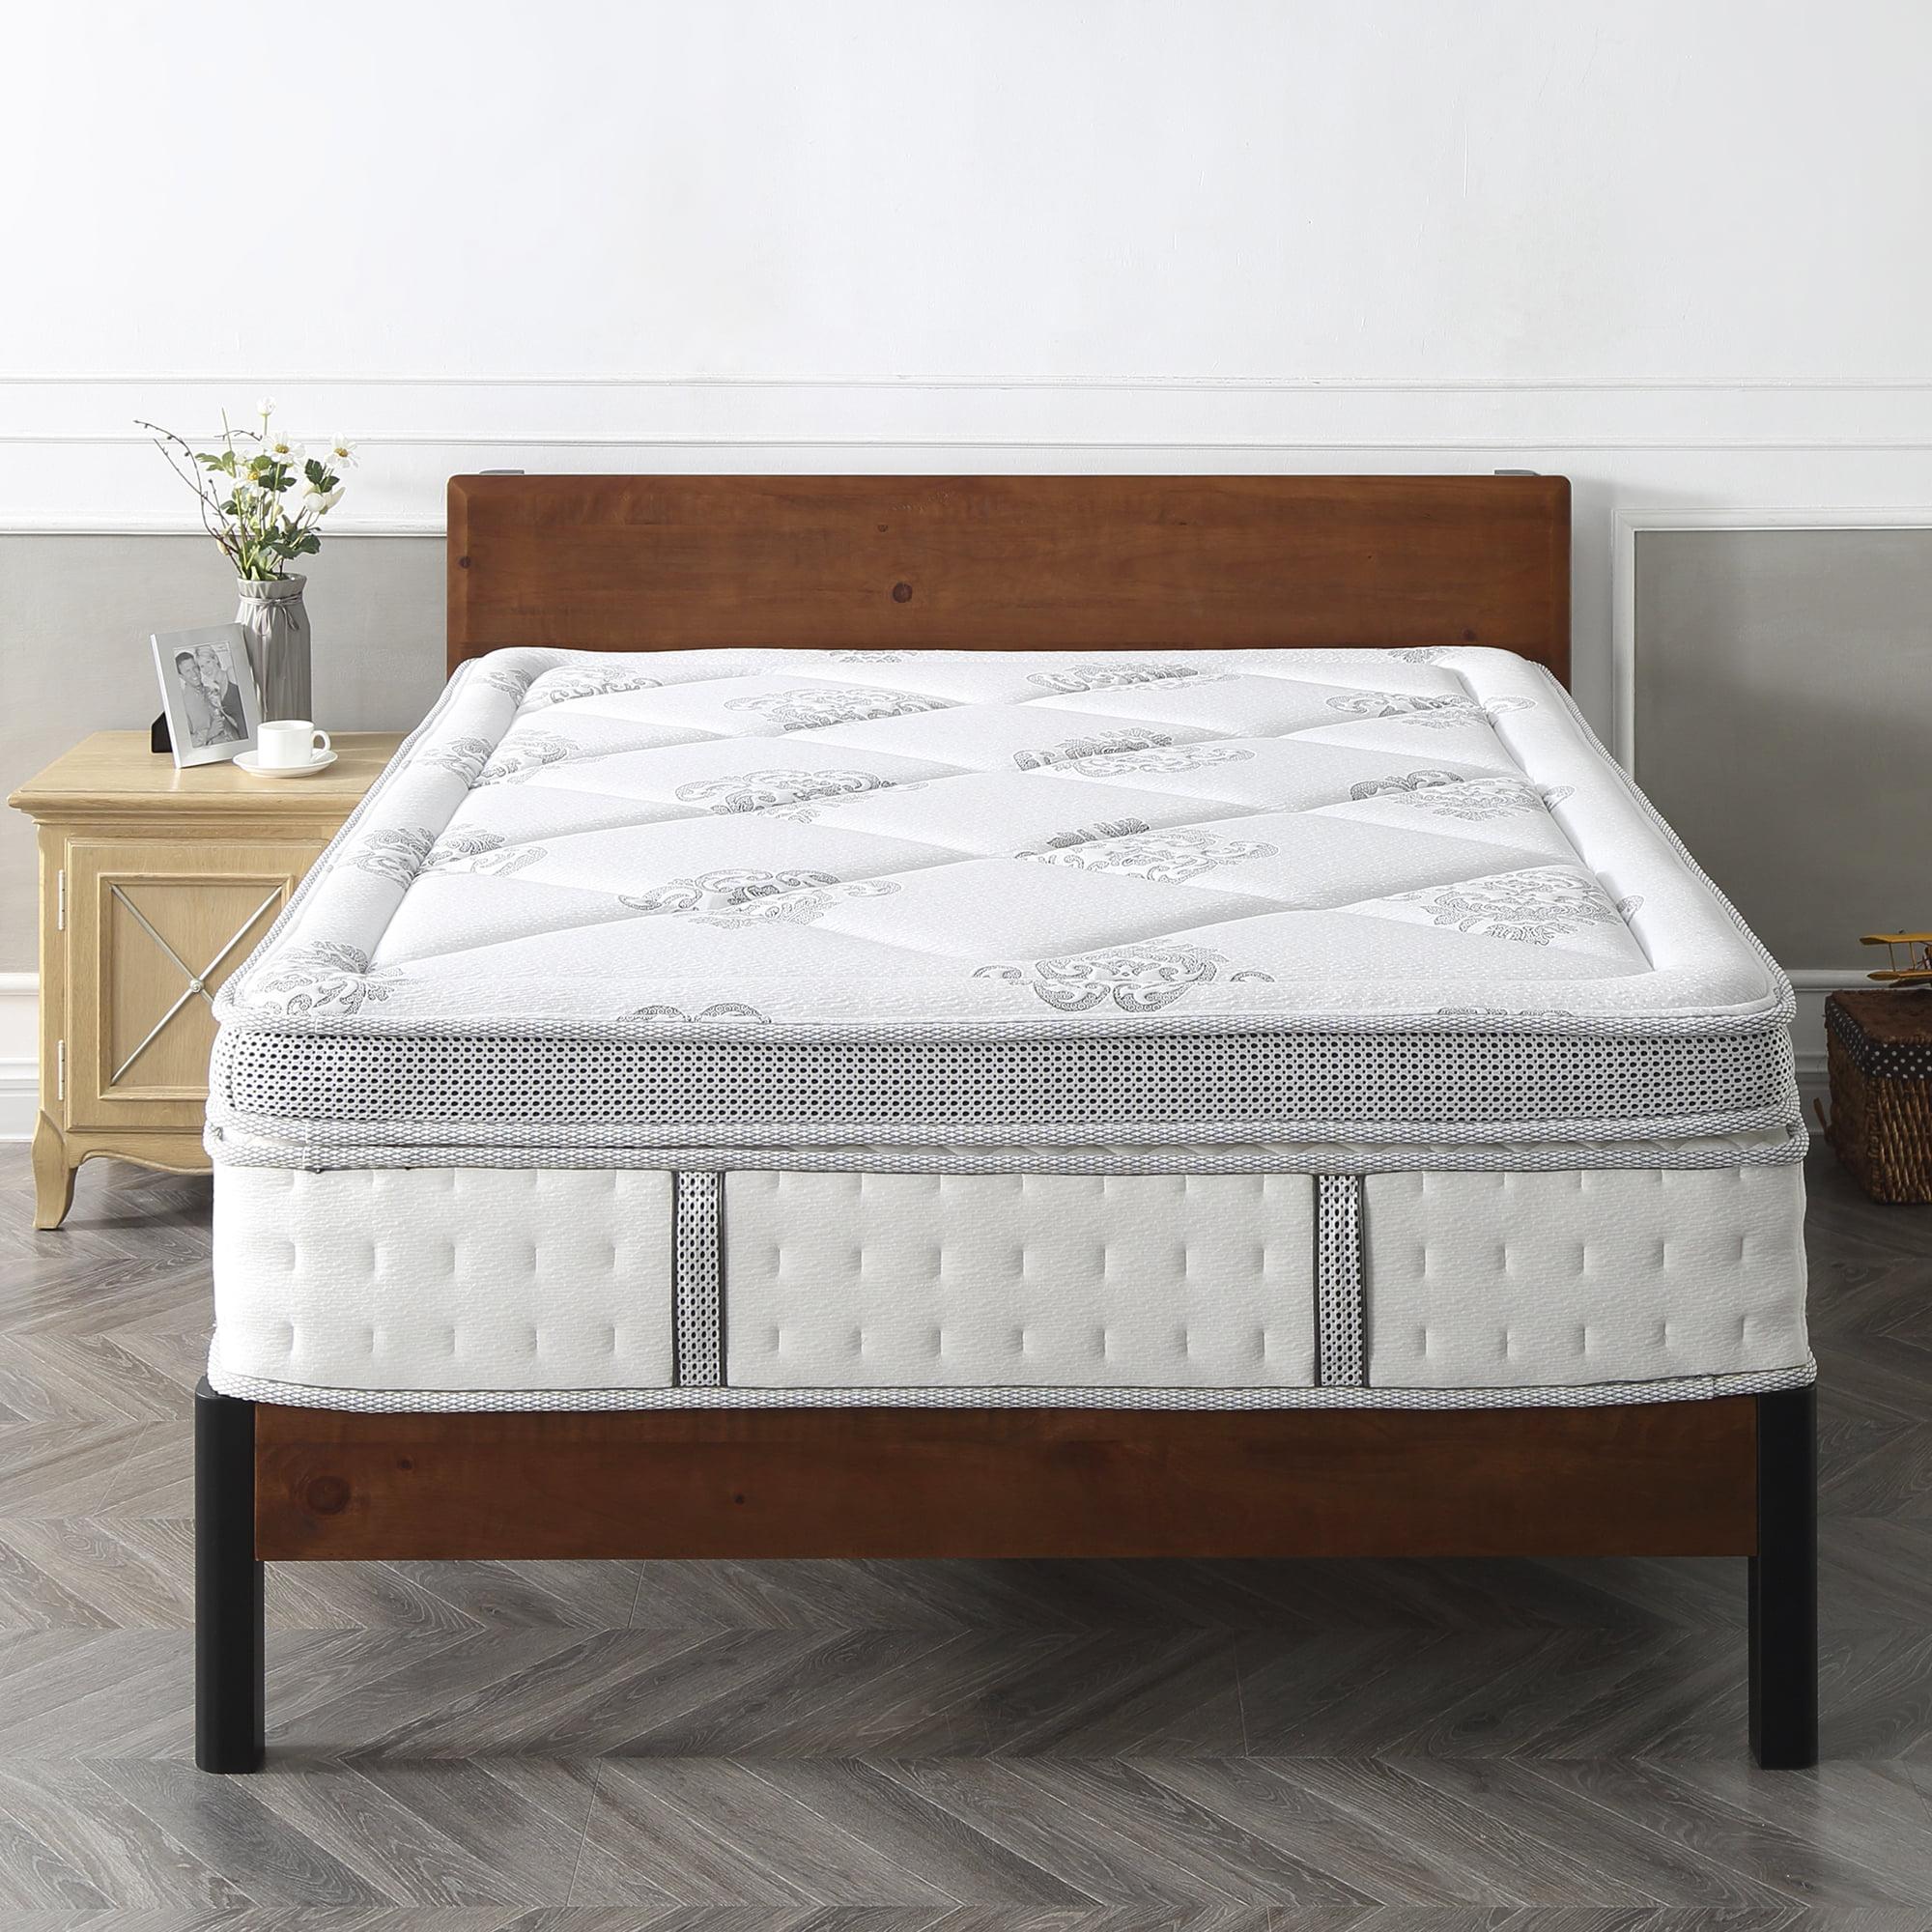 Modern Sleep Gramercy Euro-Top Cool Gel Memory Foam and Innerspring Hybrid 14-Inch Mattress, Multiple Sizes